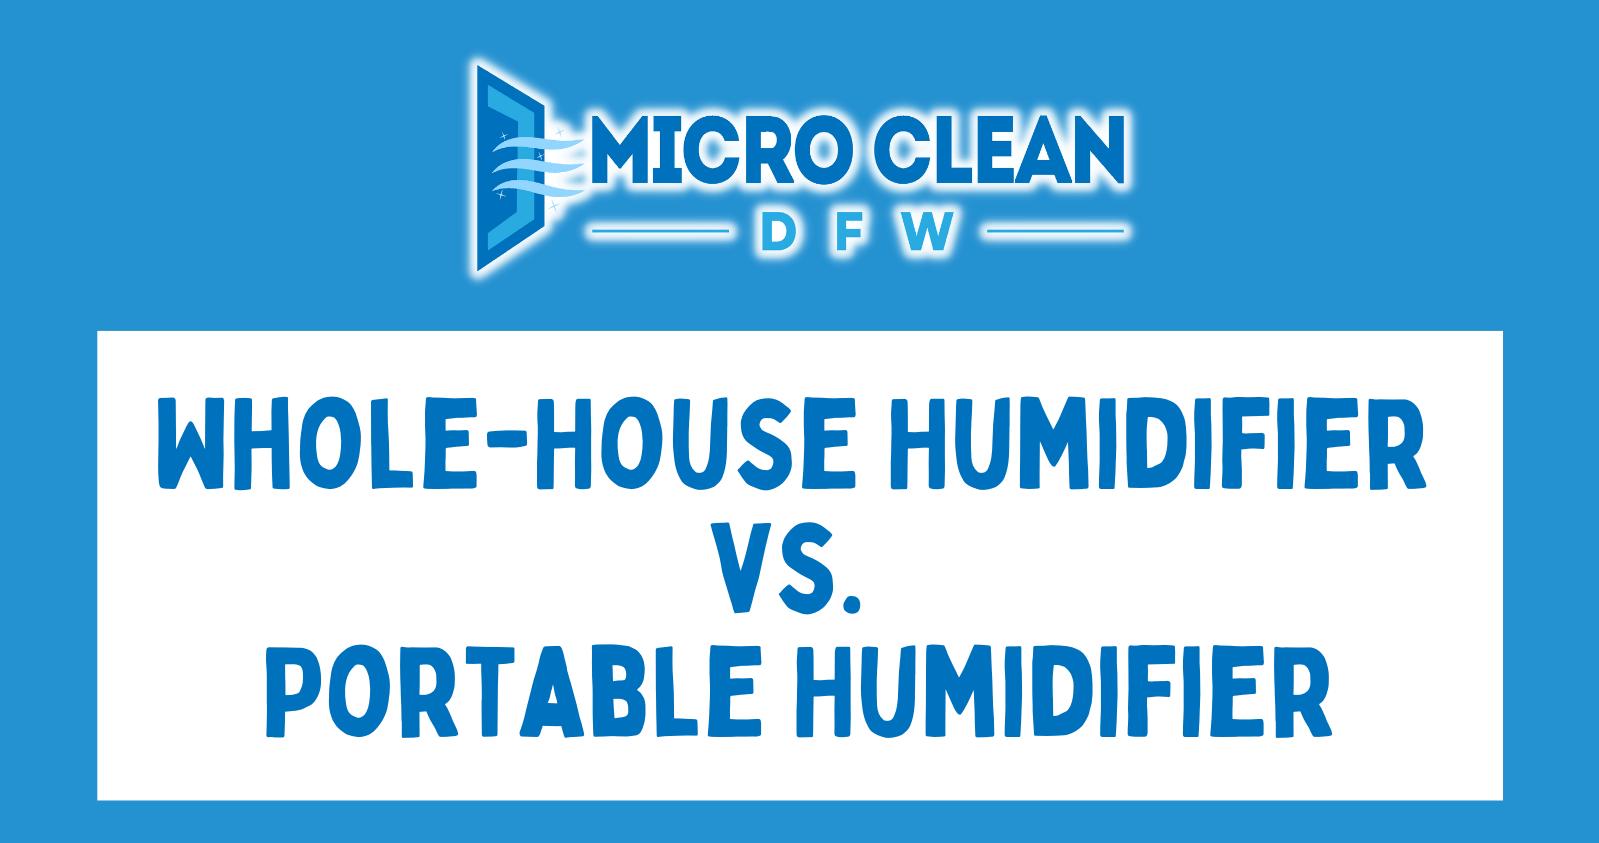 Whole-House Humidifier vs. Portable Humidifier